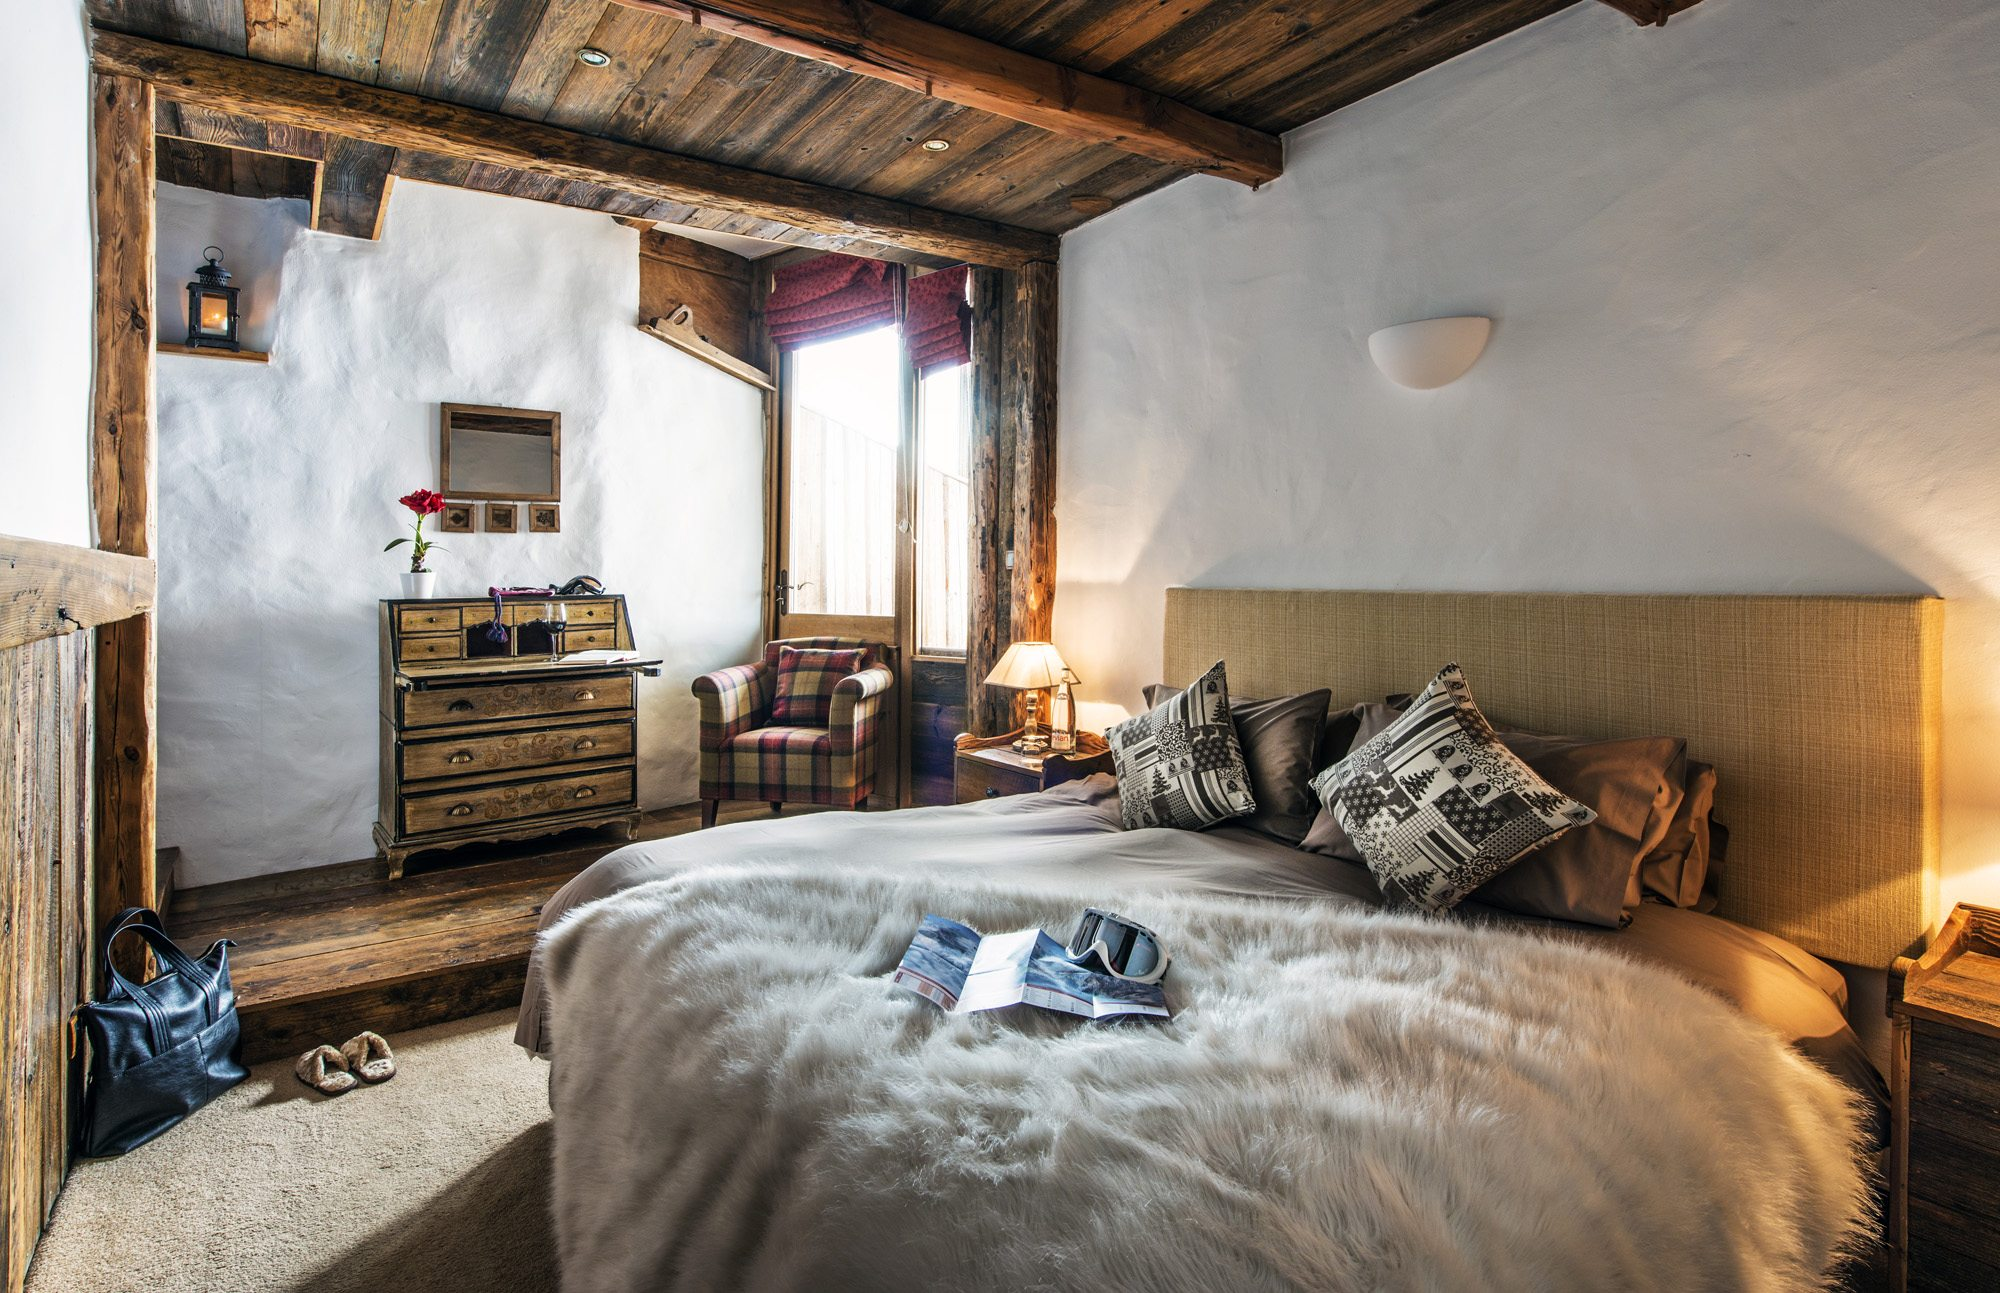 le-kilimanjaro-bedroom-makalu-2